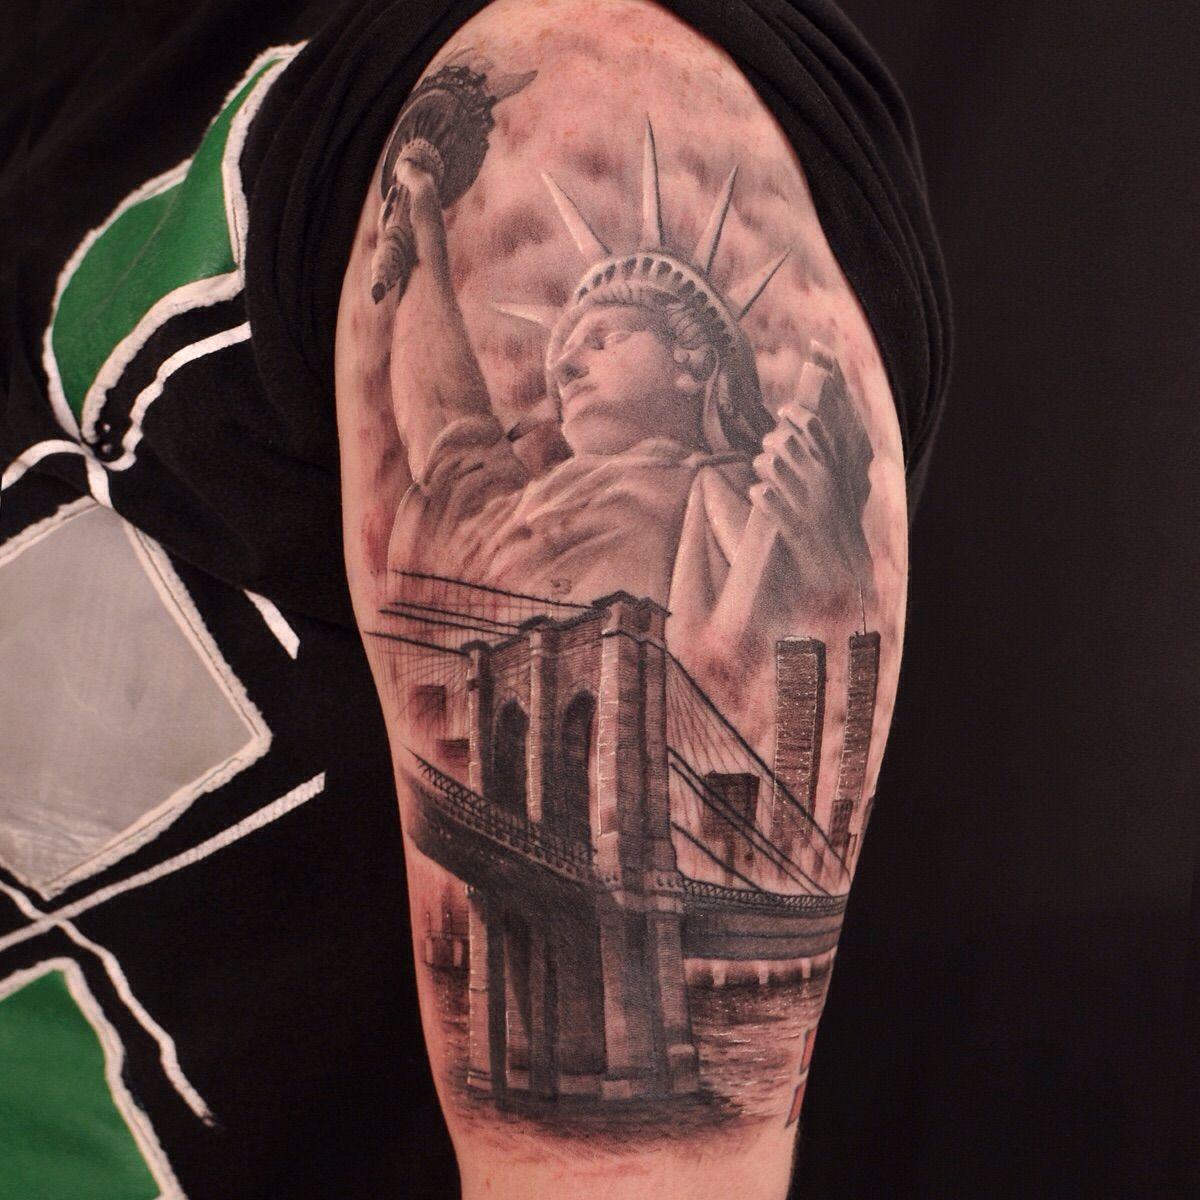 New York Sleeve Tattoo Google Search New York Tattoo Nyc Tattoo Sleeve Tattoos